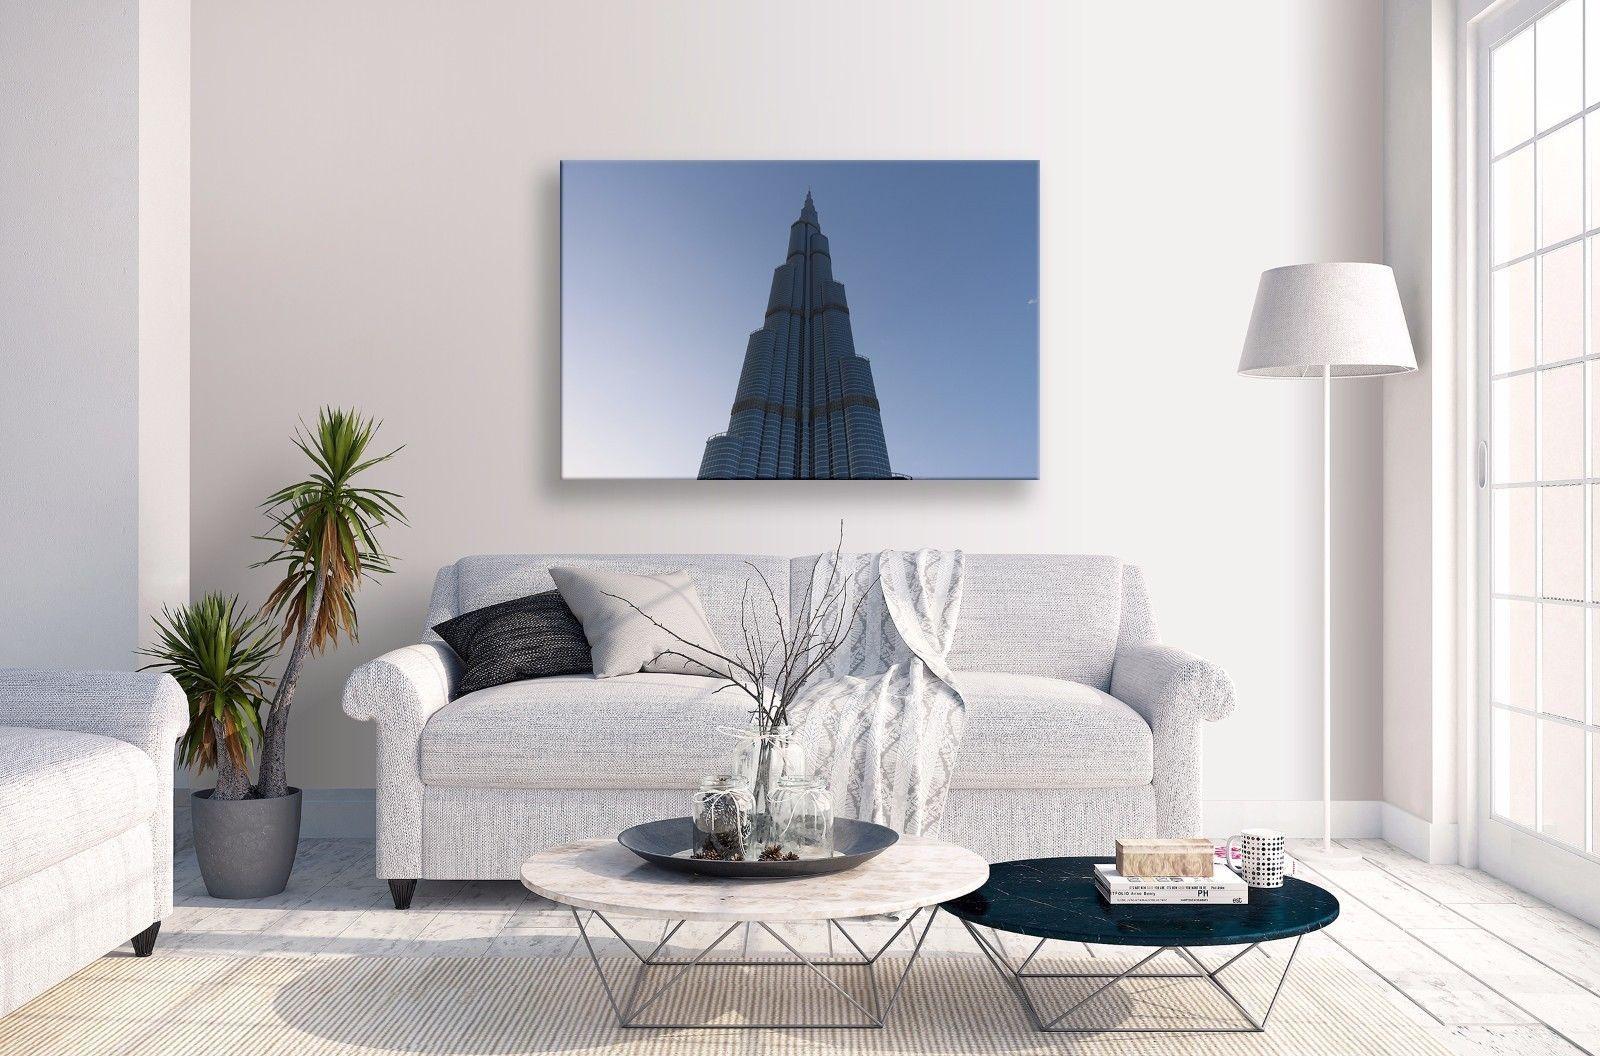 Burj kalifa canvas abstract blue sky dubai landscape wall art